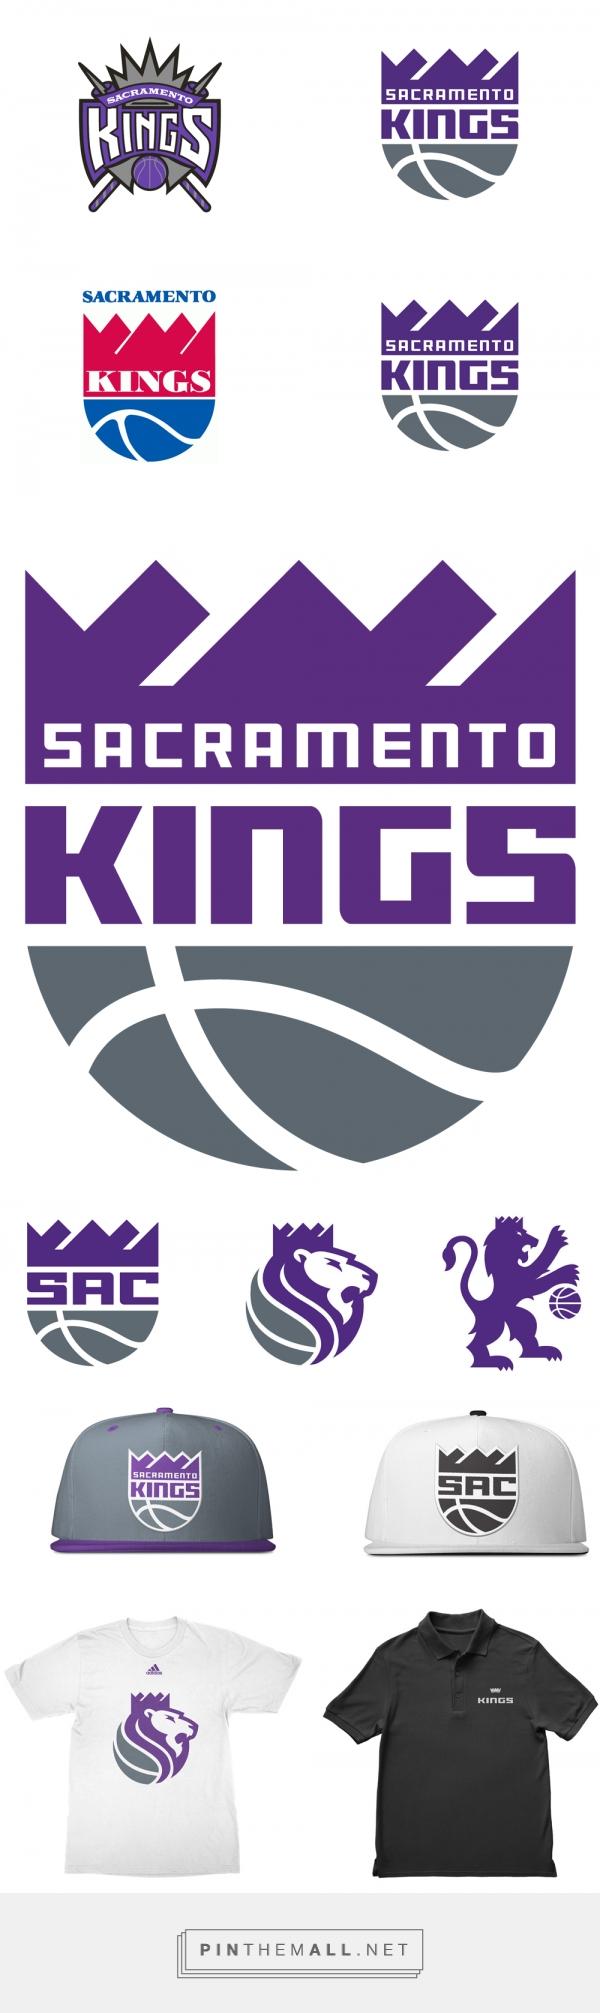 Brand New: New Logos for Sacramento Kings by RARE - created via https://pinthemall.net